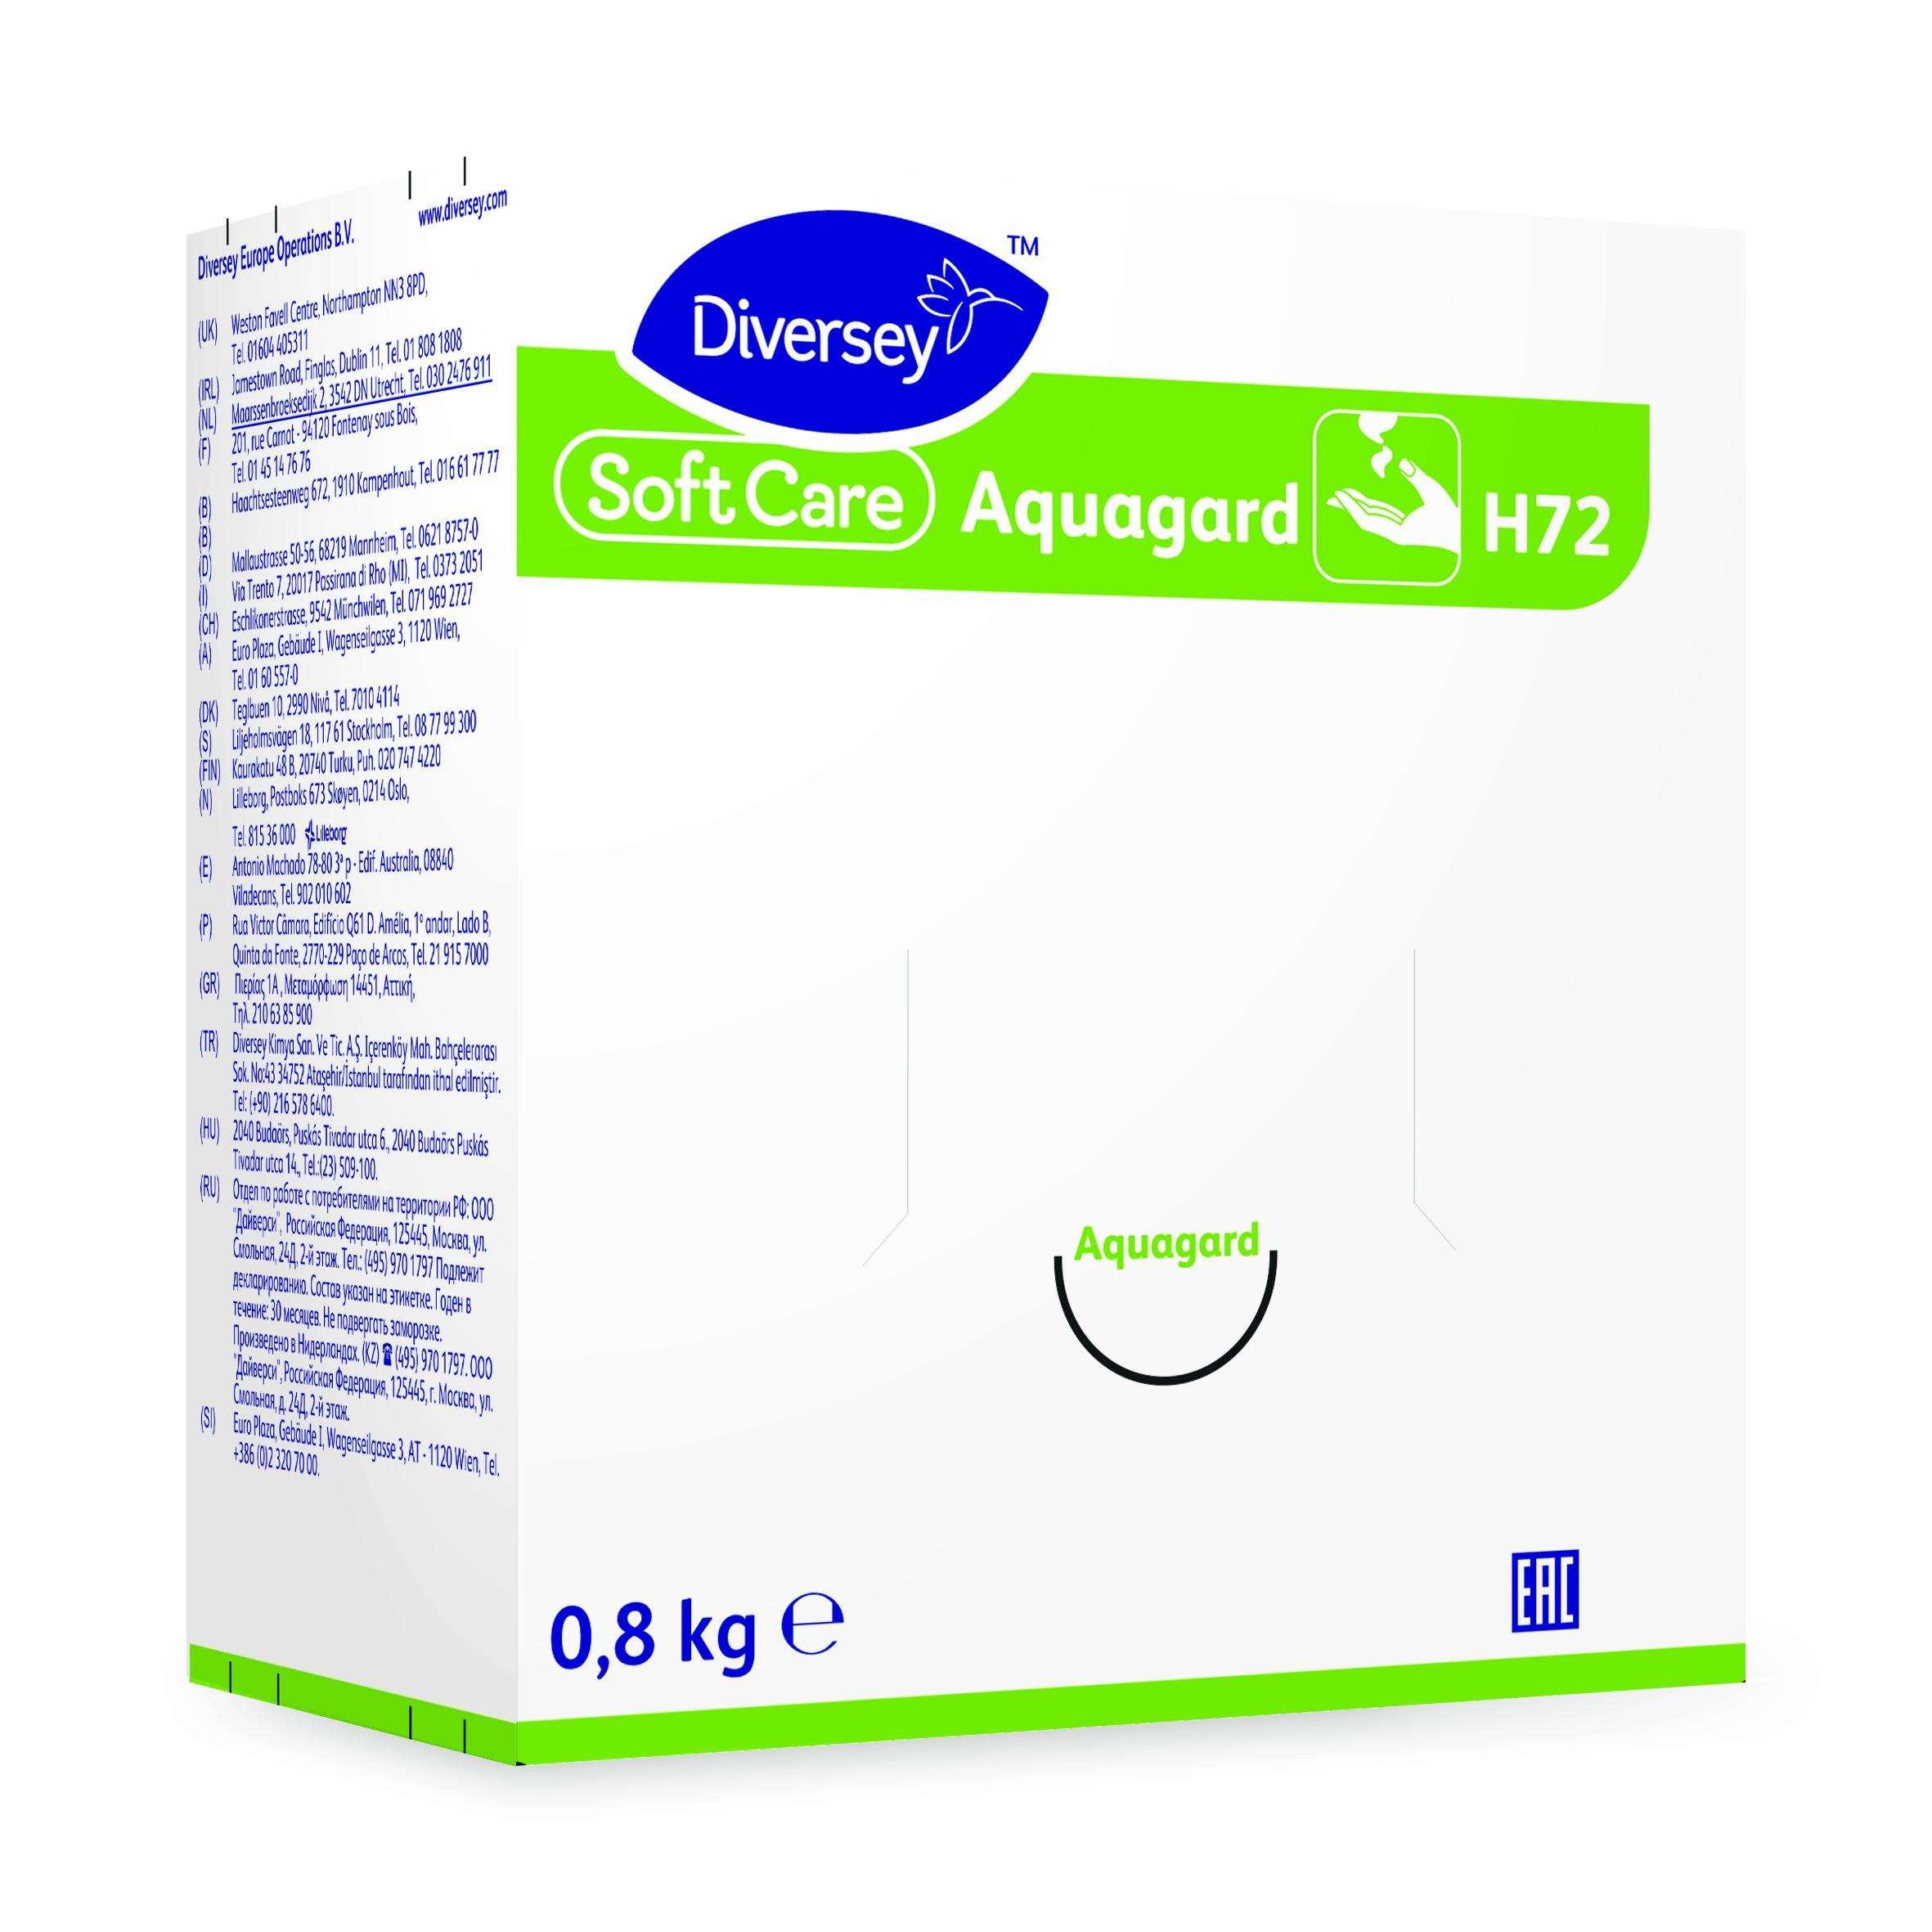 100953625-Soft-Care-Aquagard-H72-800ml-box-CMYK-20x20cm.jpg